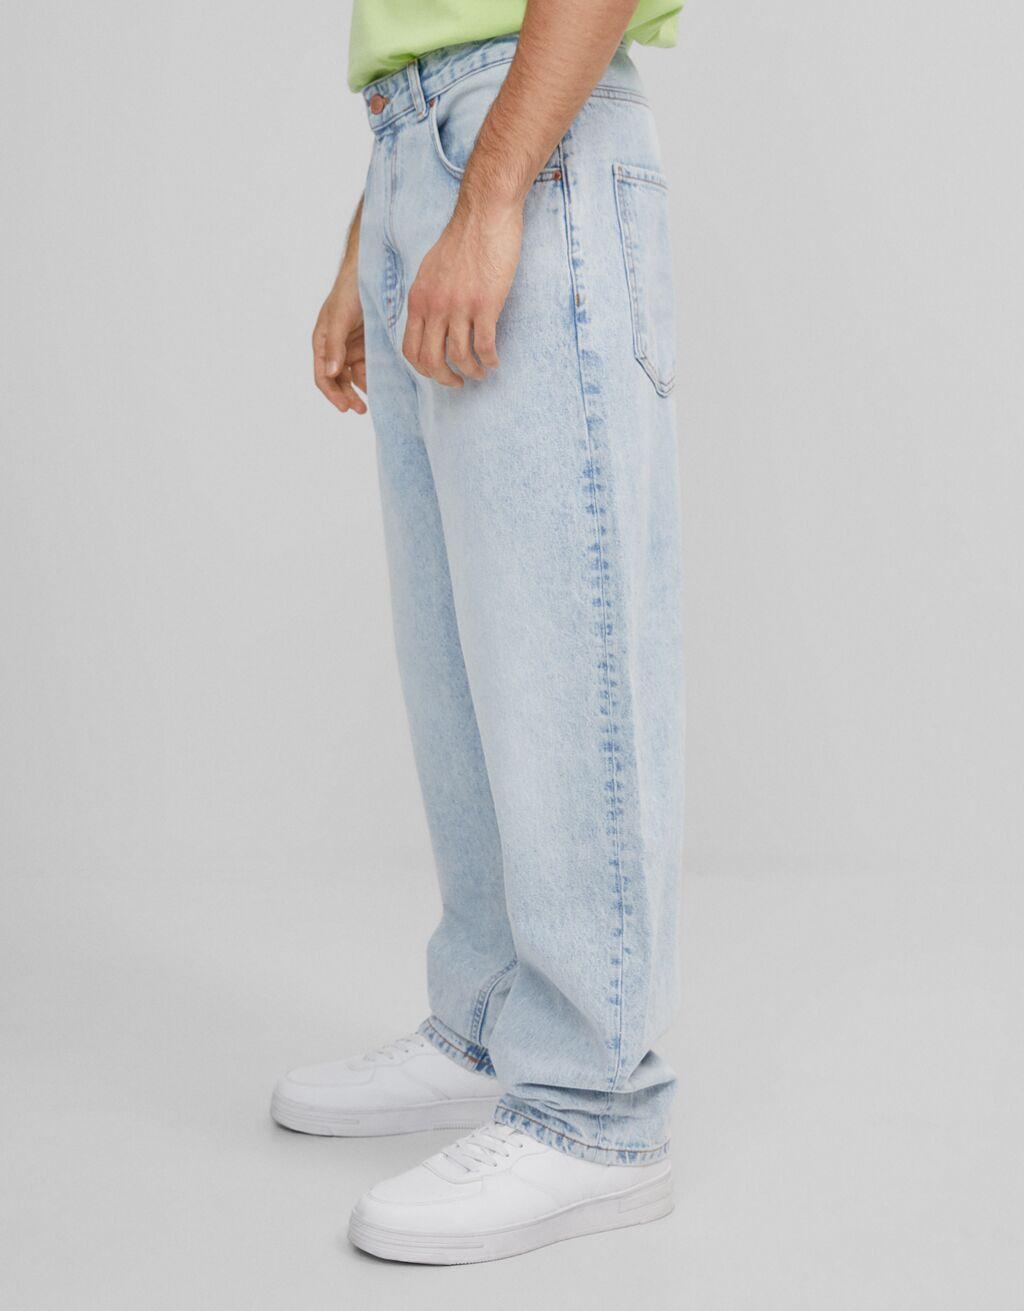 Wide-leg '90s jeans